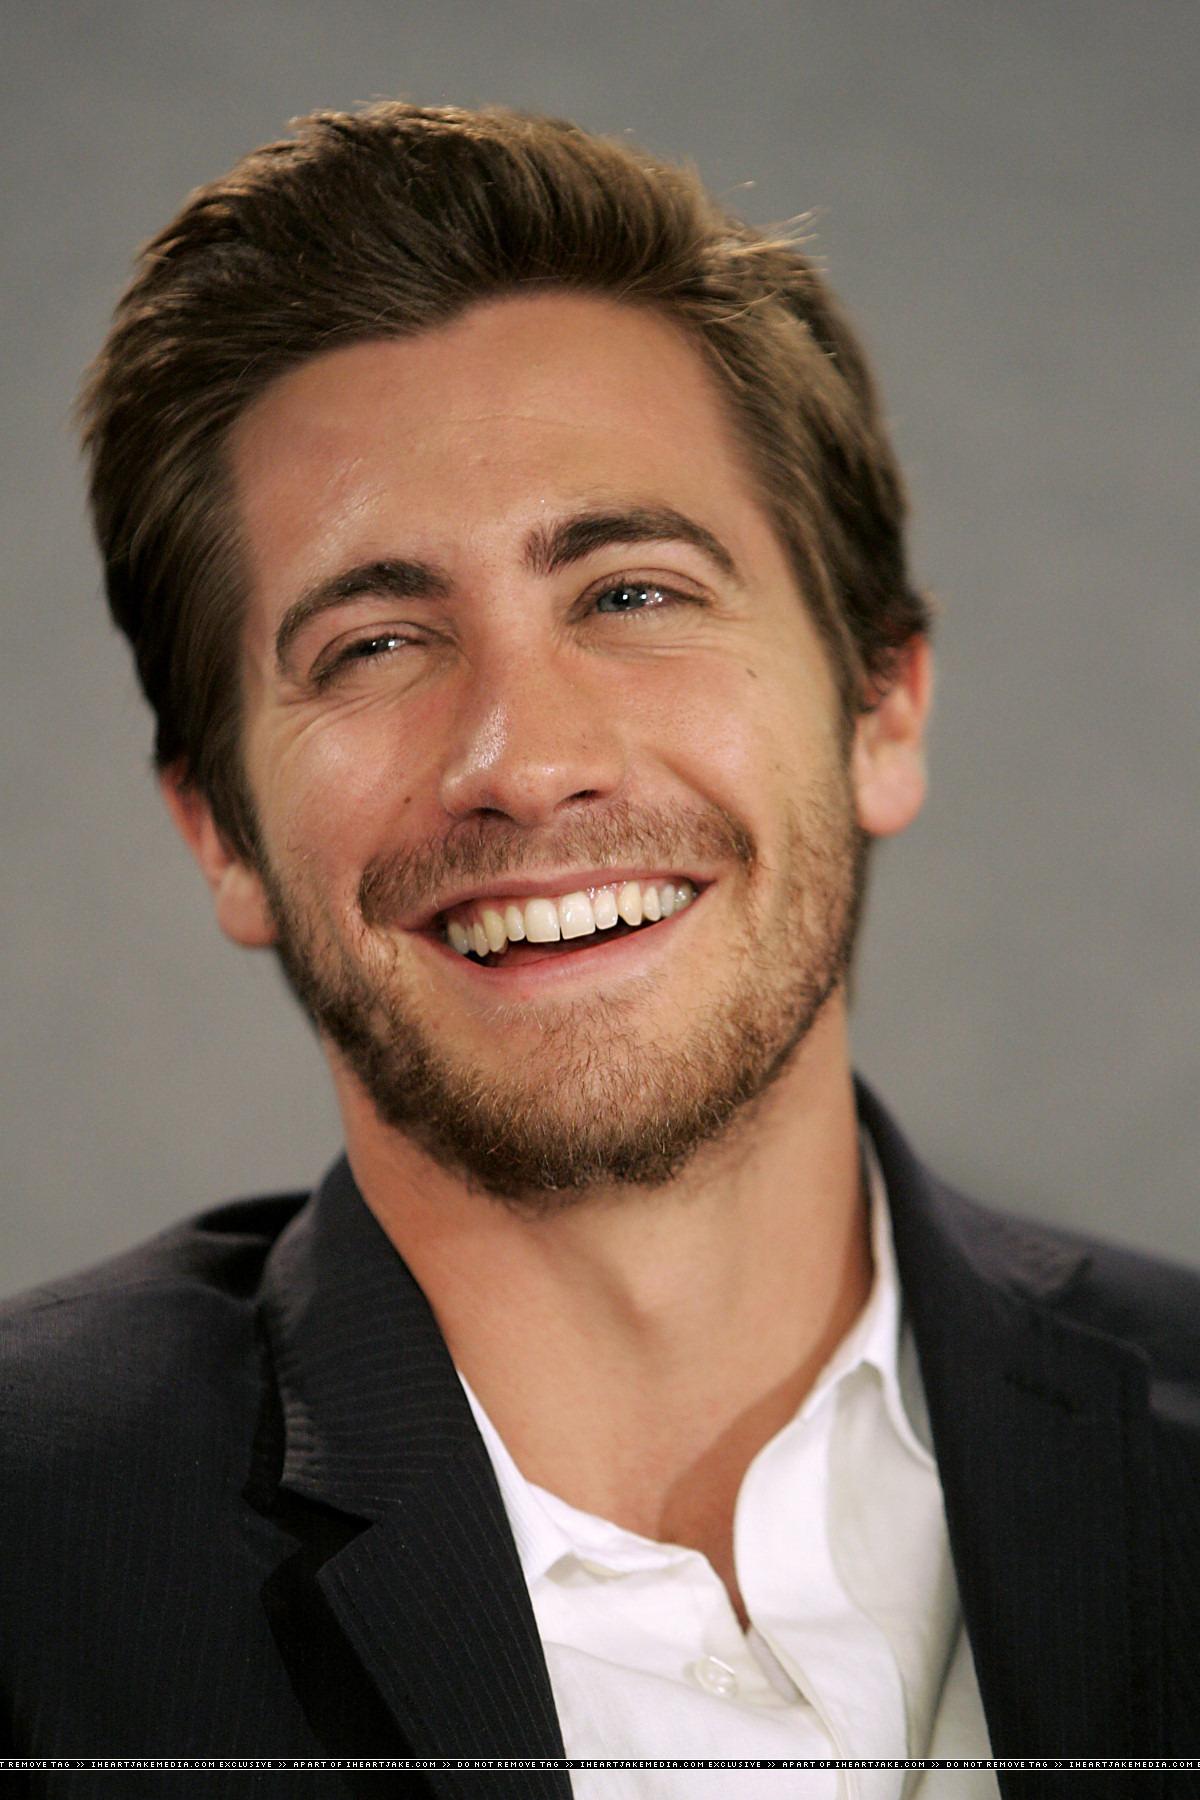 Maggie gyllenhaal in the deuce s01e06 6